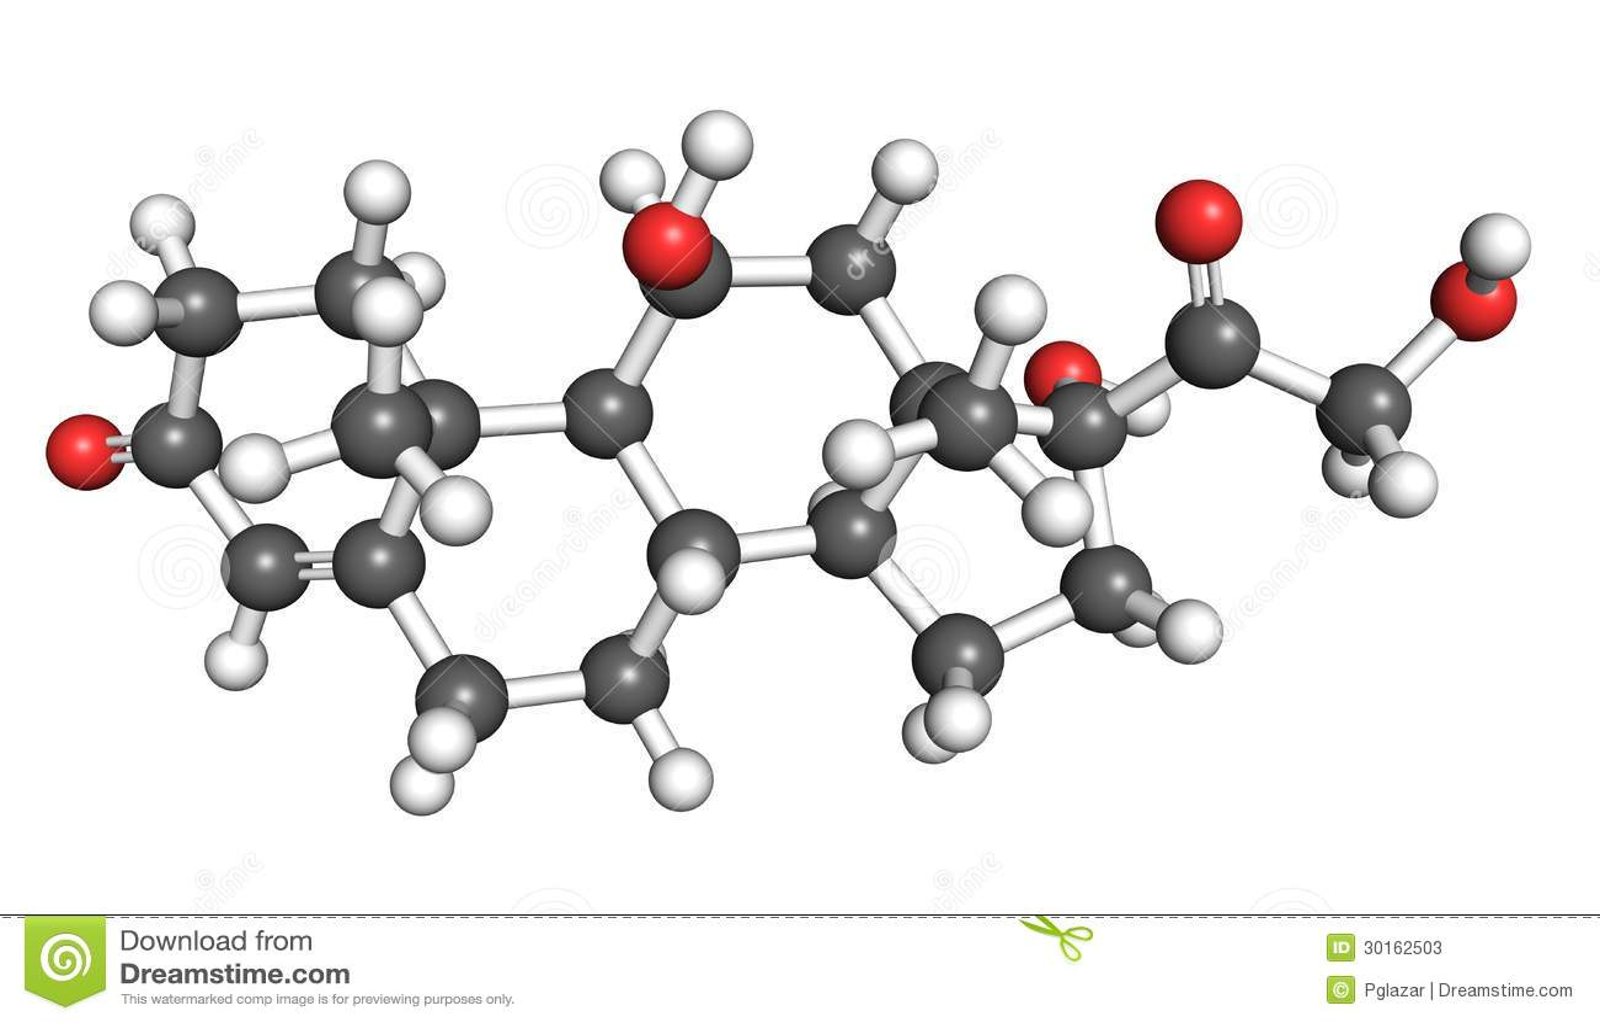 steroid lipid structure